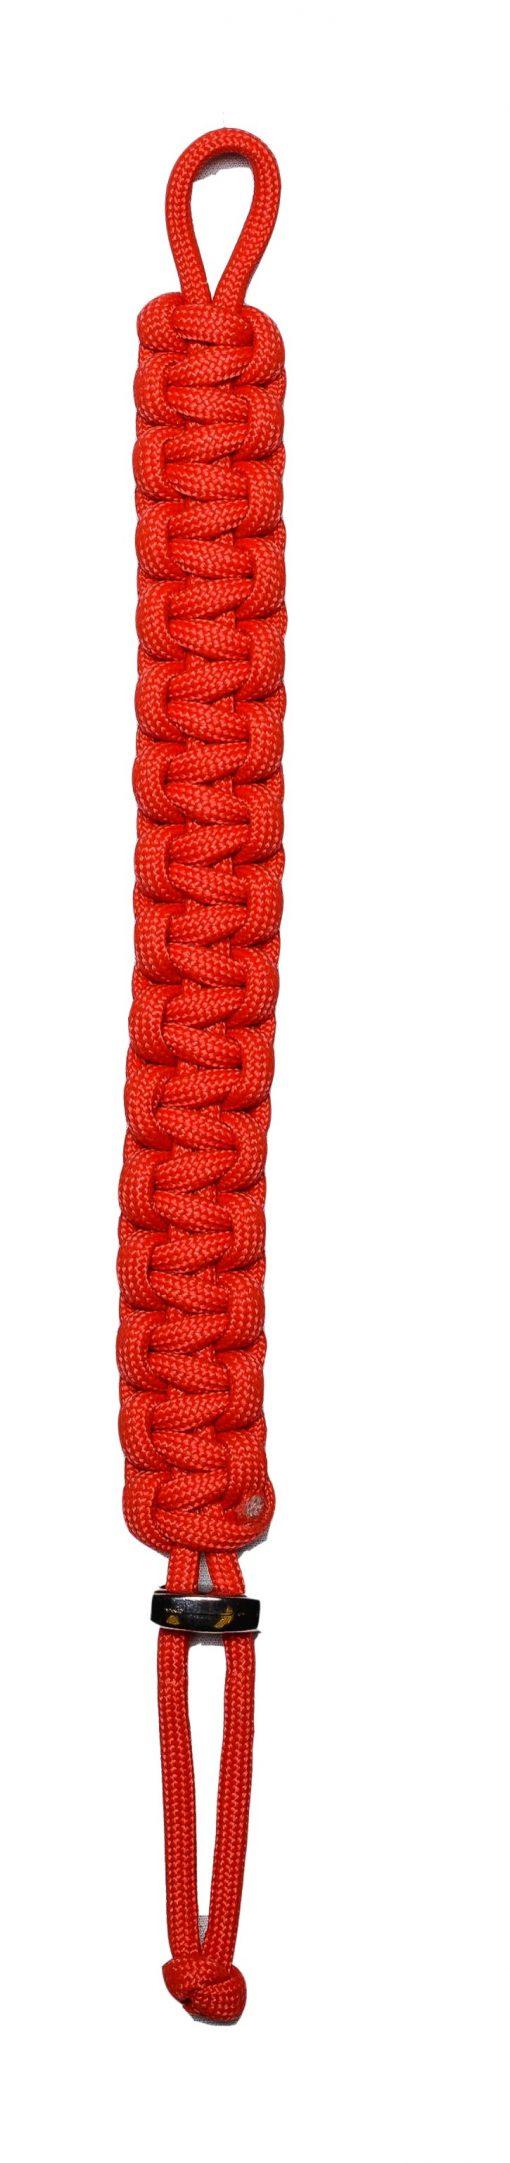 Guardian Adjustable Paracord Bracelet (Wrath) - Case of 36